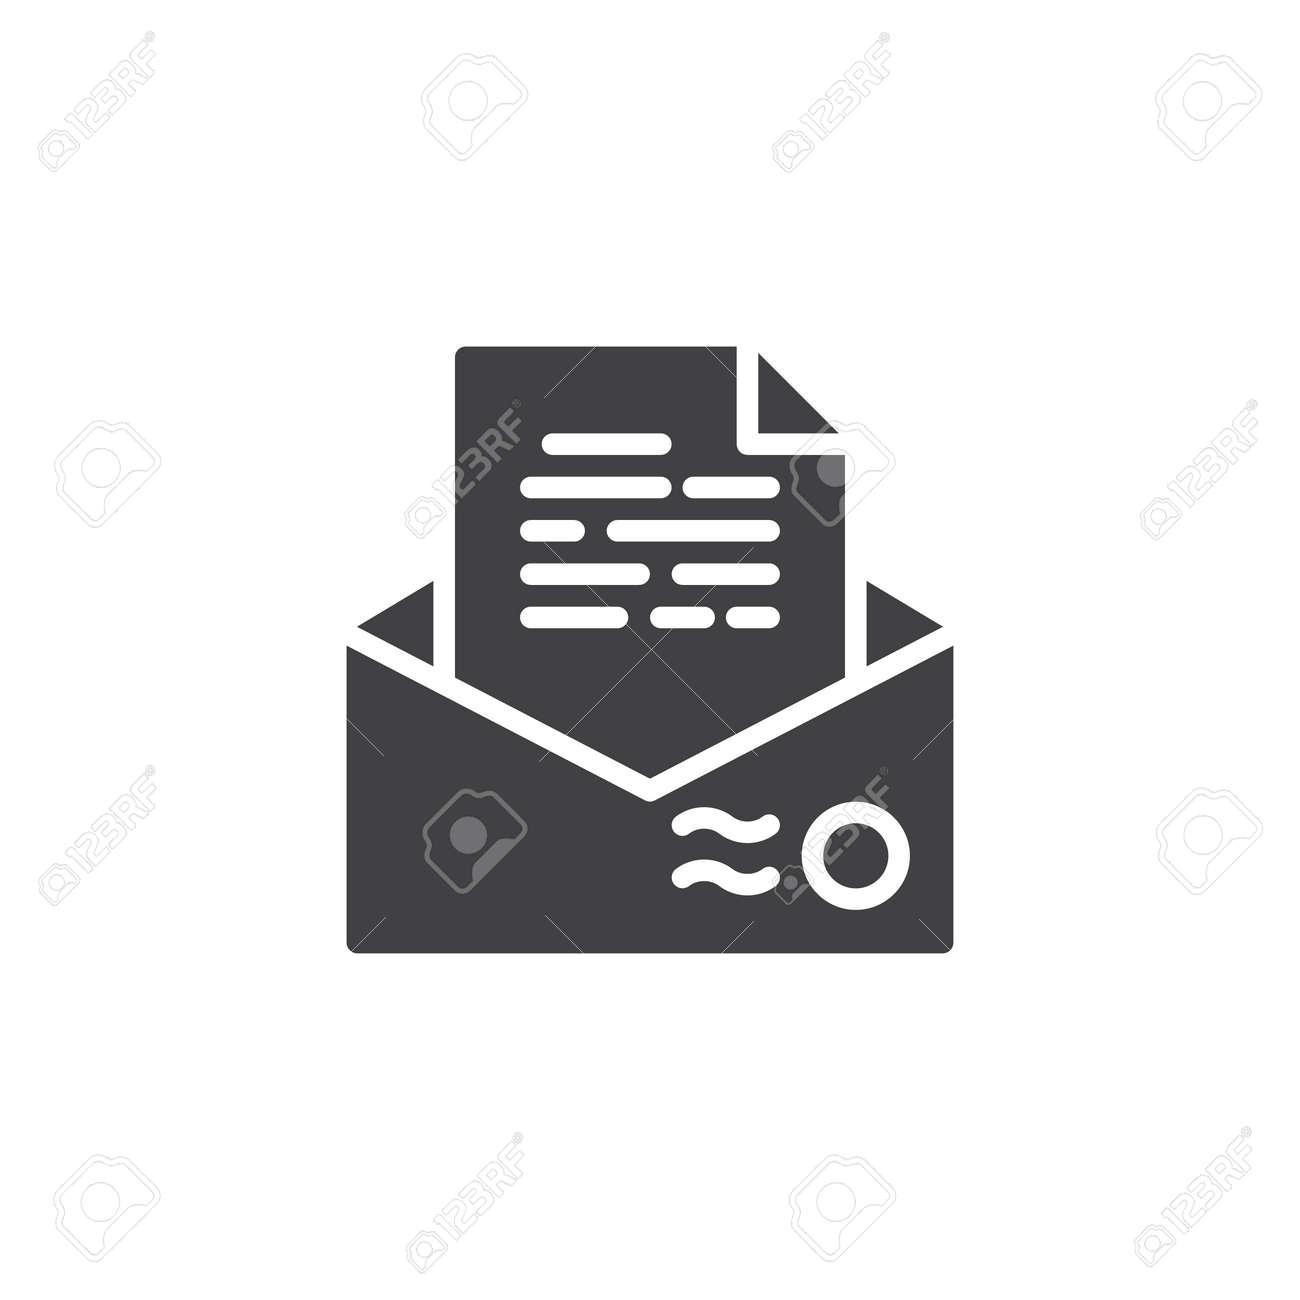 illustration recommendation letter envelope icon vector filled flat sign solid pictogram isolated on white resume mail symbol logo illustration